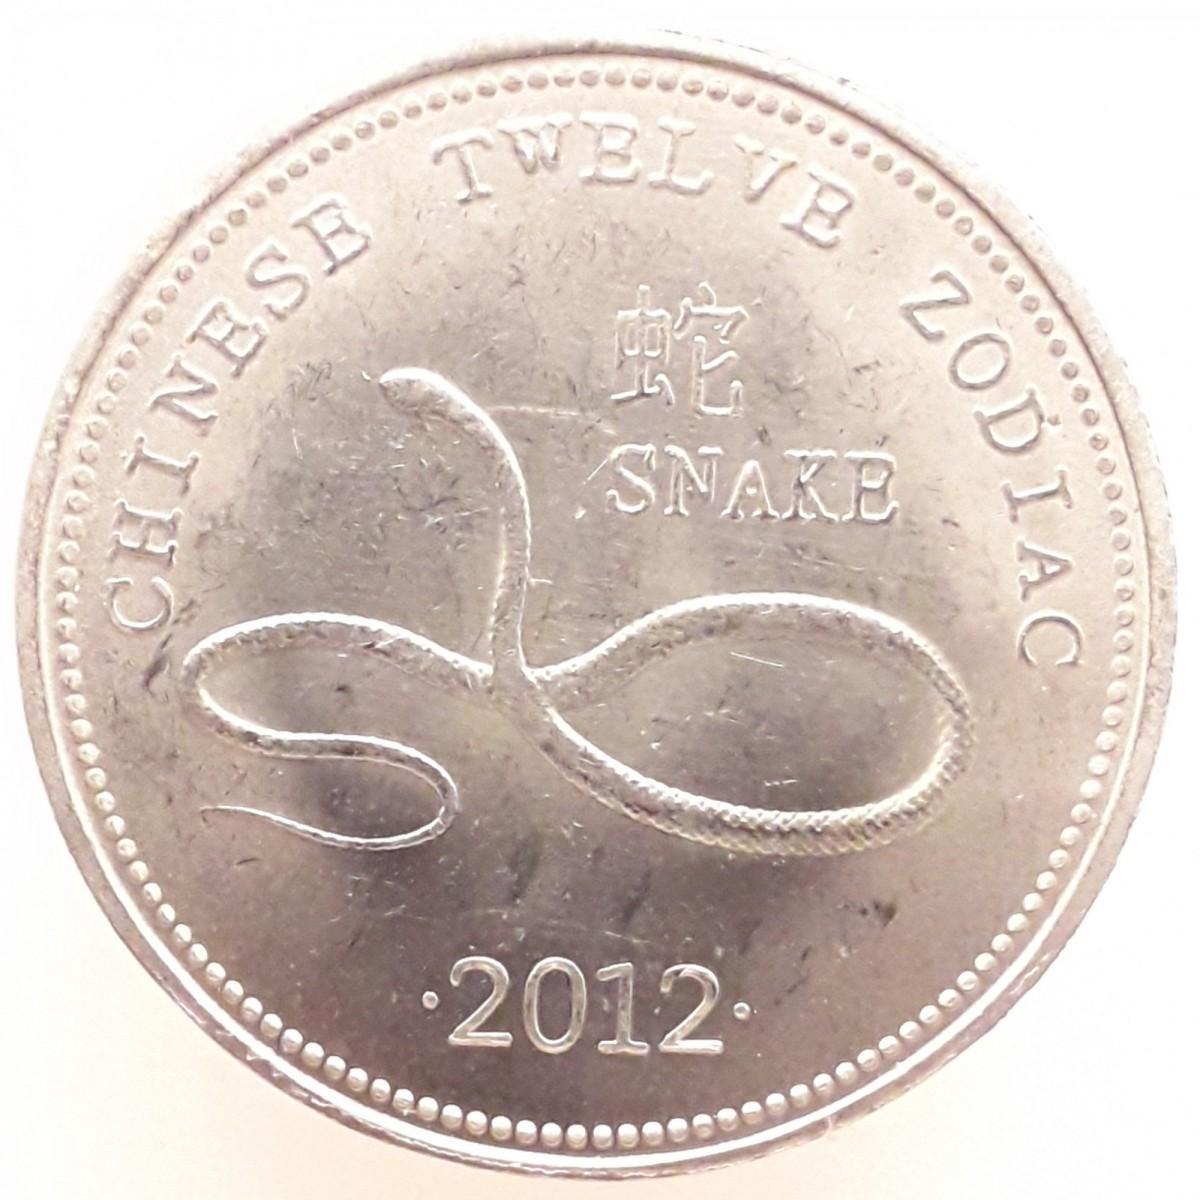 Сомалиленд 10 шиллингов 2012 года - Змея код 22635